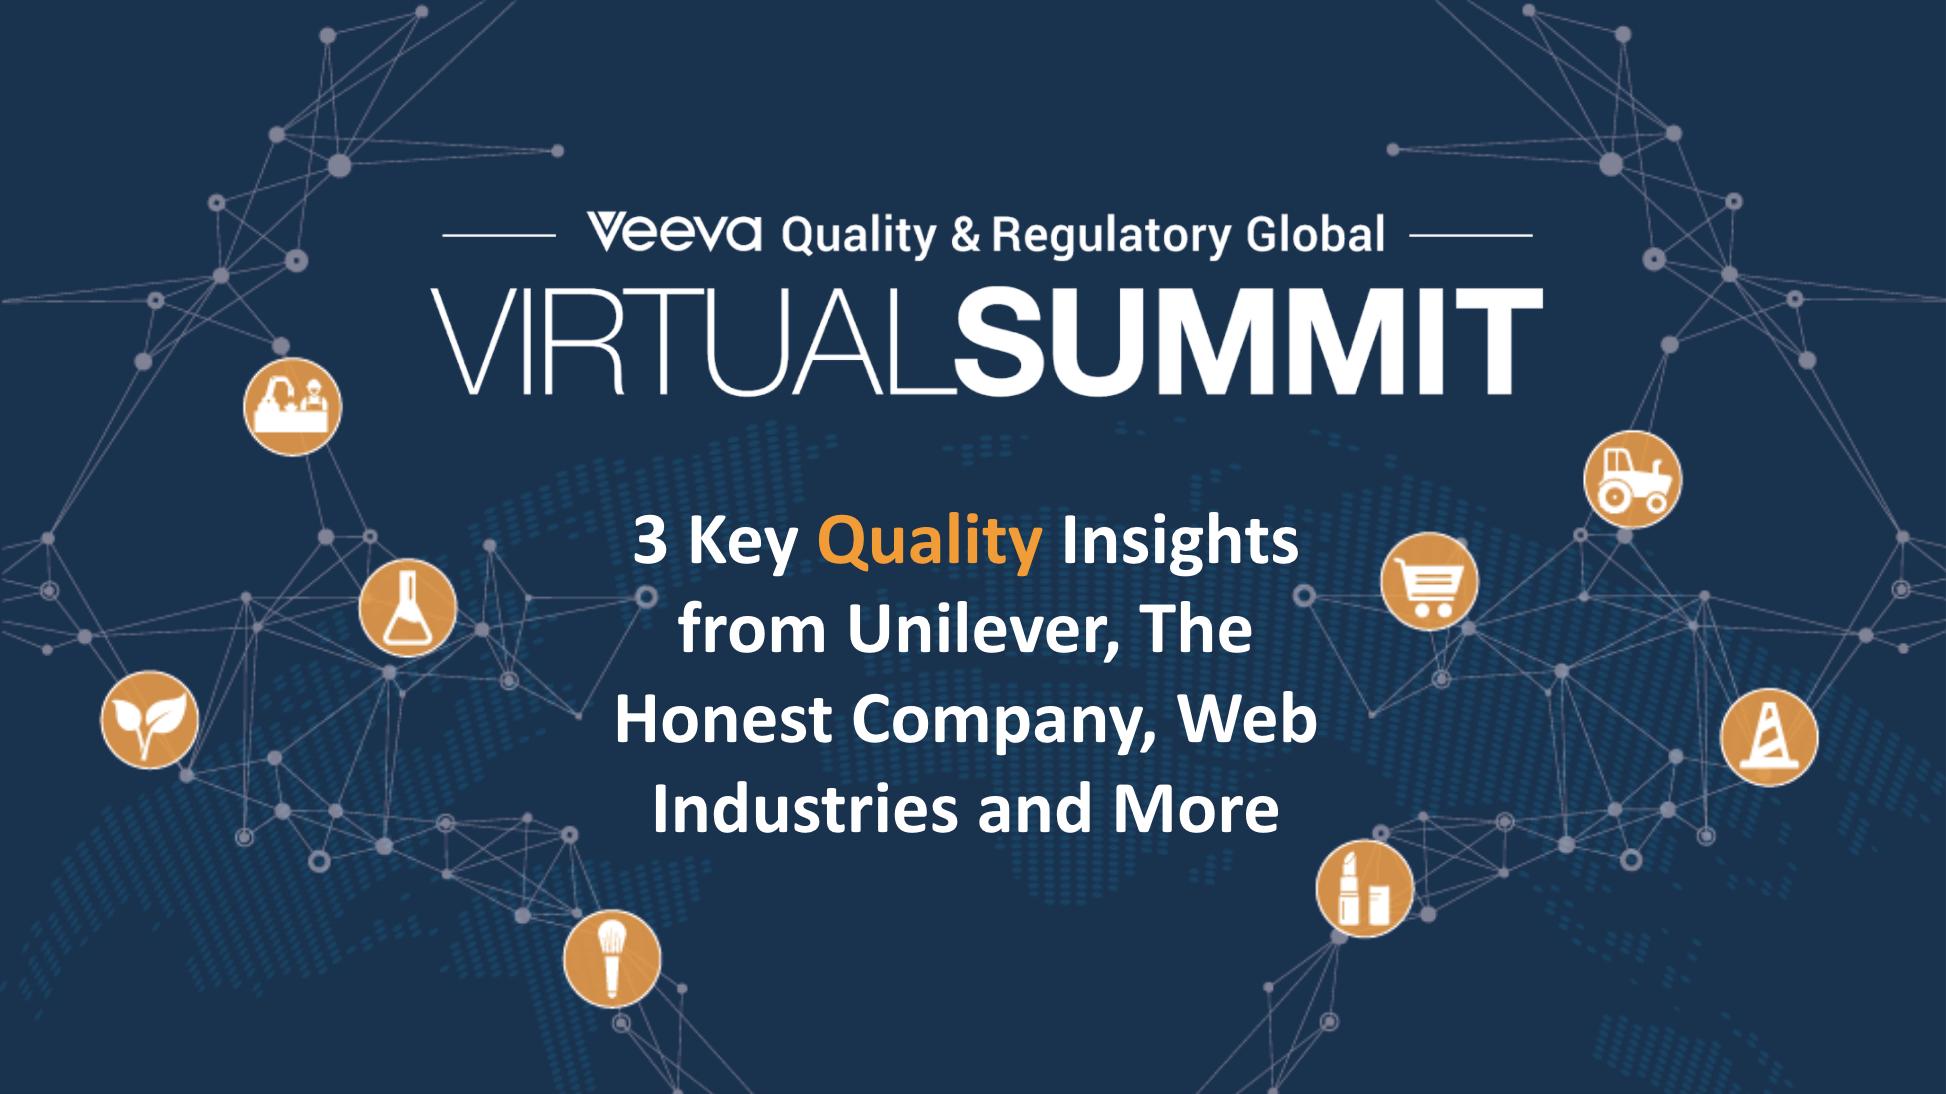 2020 Veeva Quality & Regulatory Virtual Summit - 3 Key Quality Insights